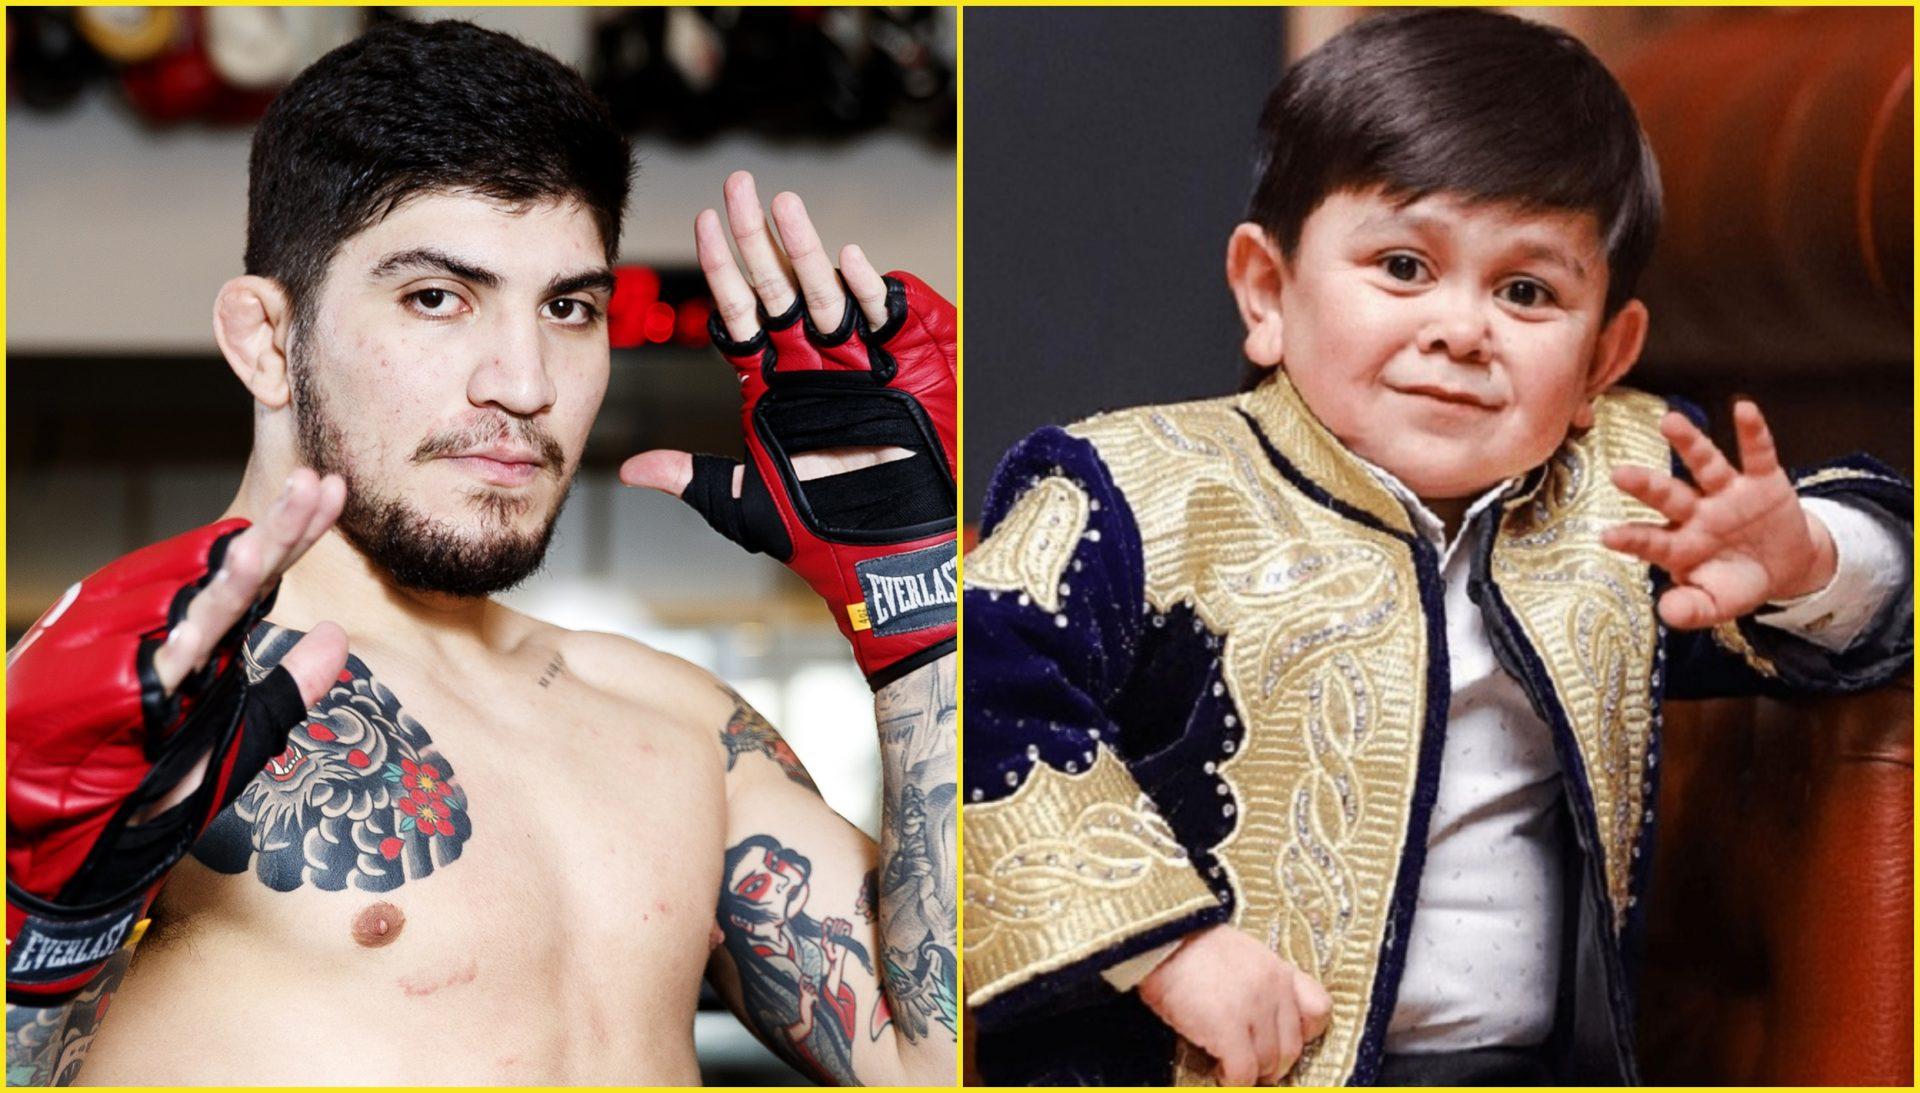 Armenian MMA fighter Dillon Danis rooting for Tajikistan's Abdu Rozik in his fight against Hasbulla - Danis